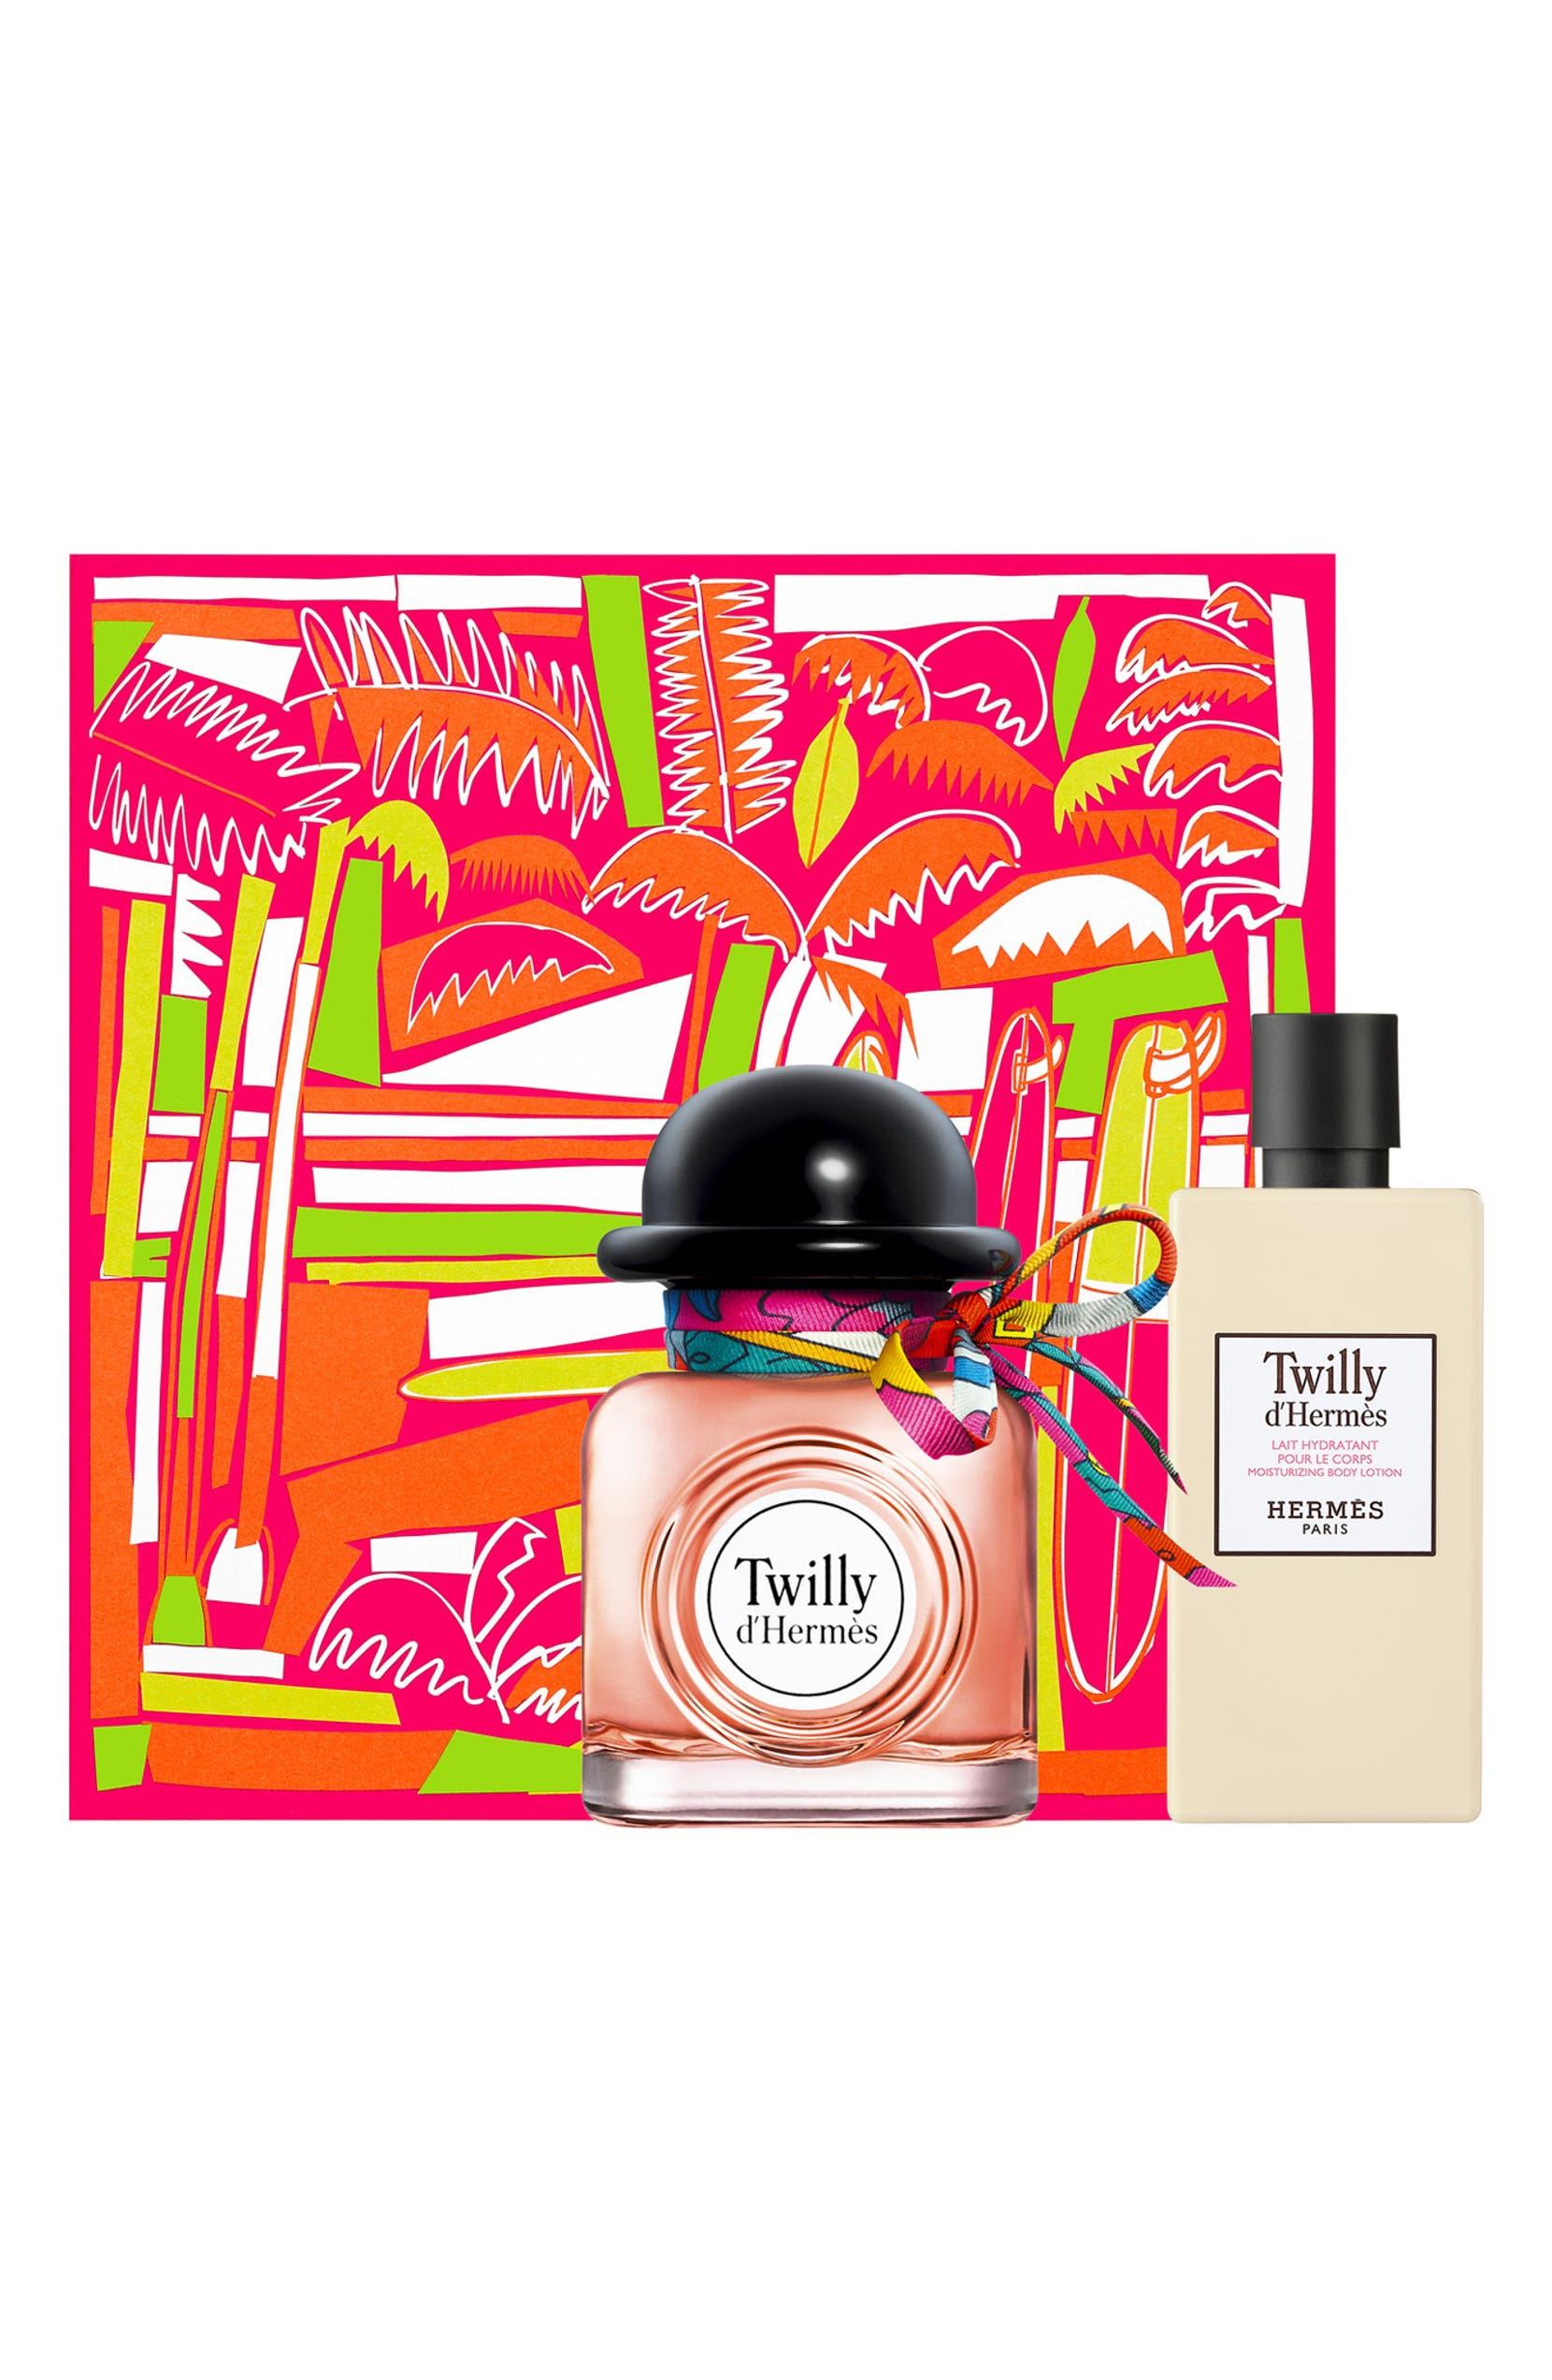 Gift D'hermès De Twilly Parfum Eau Set rtQshd